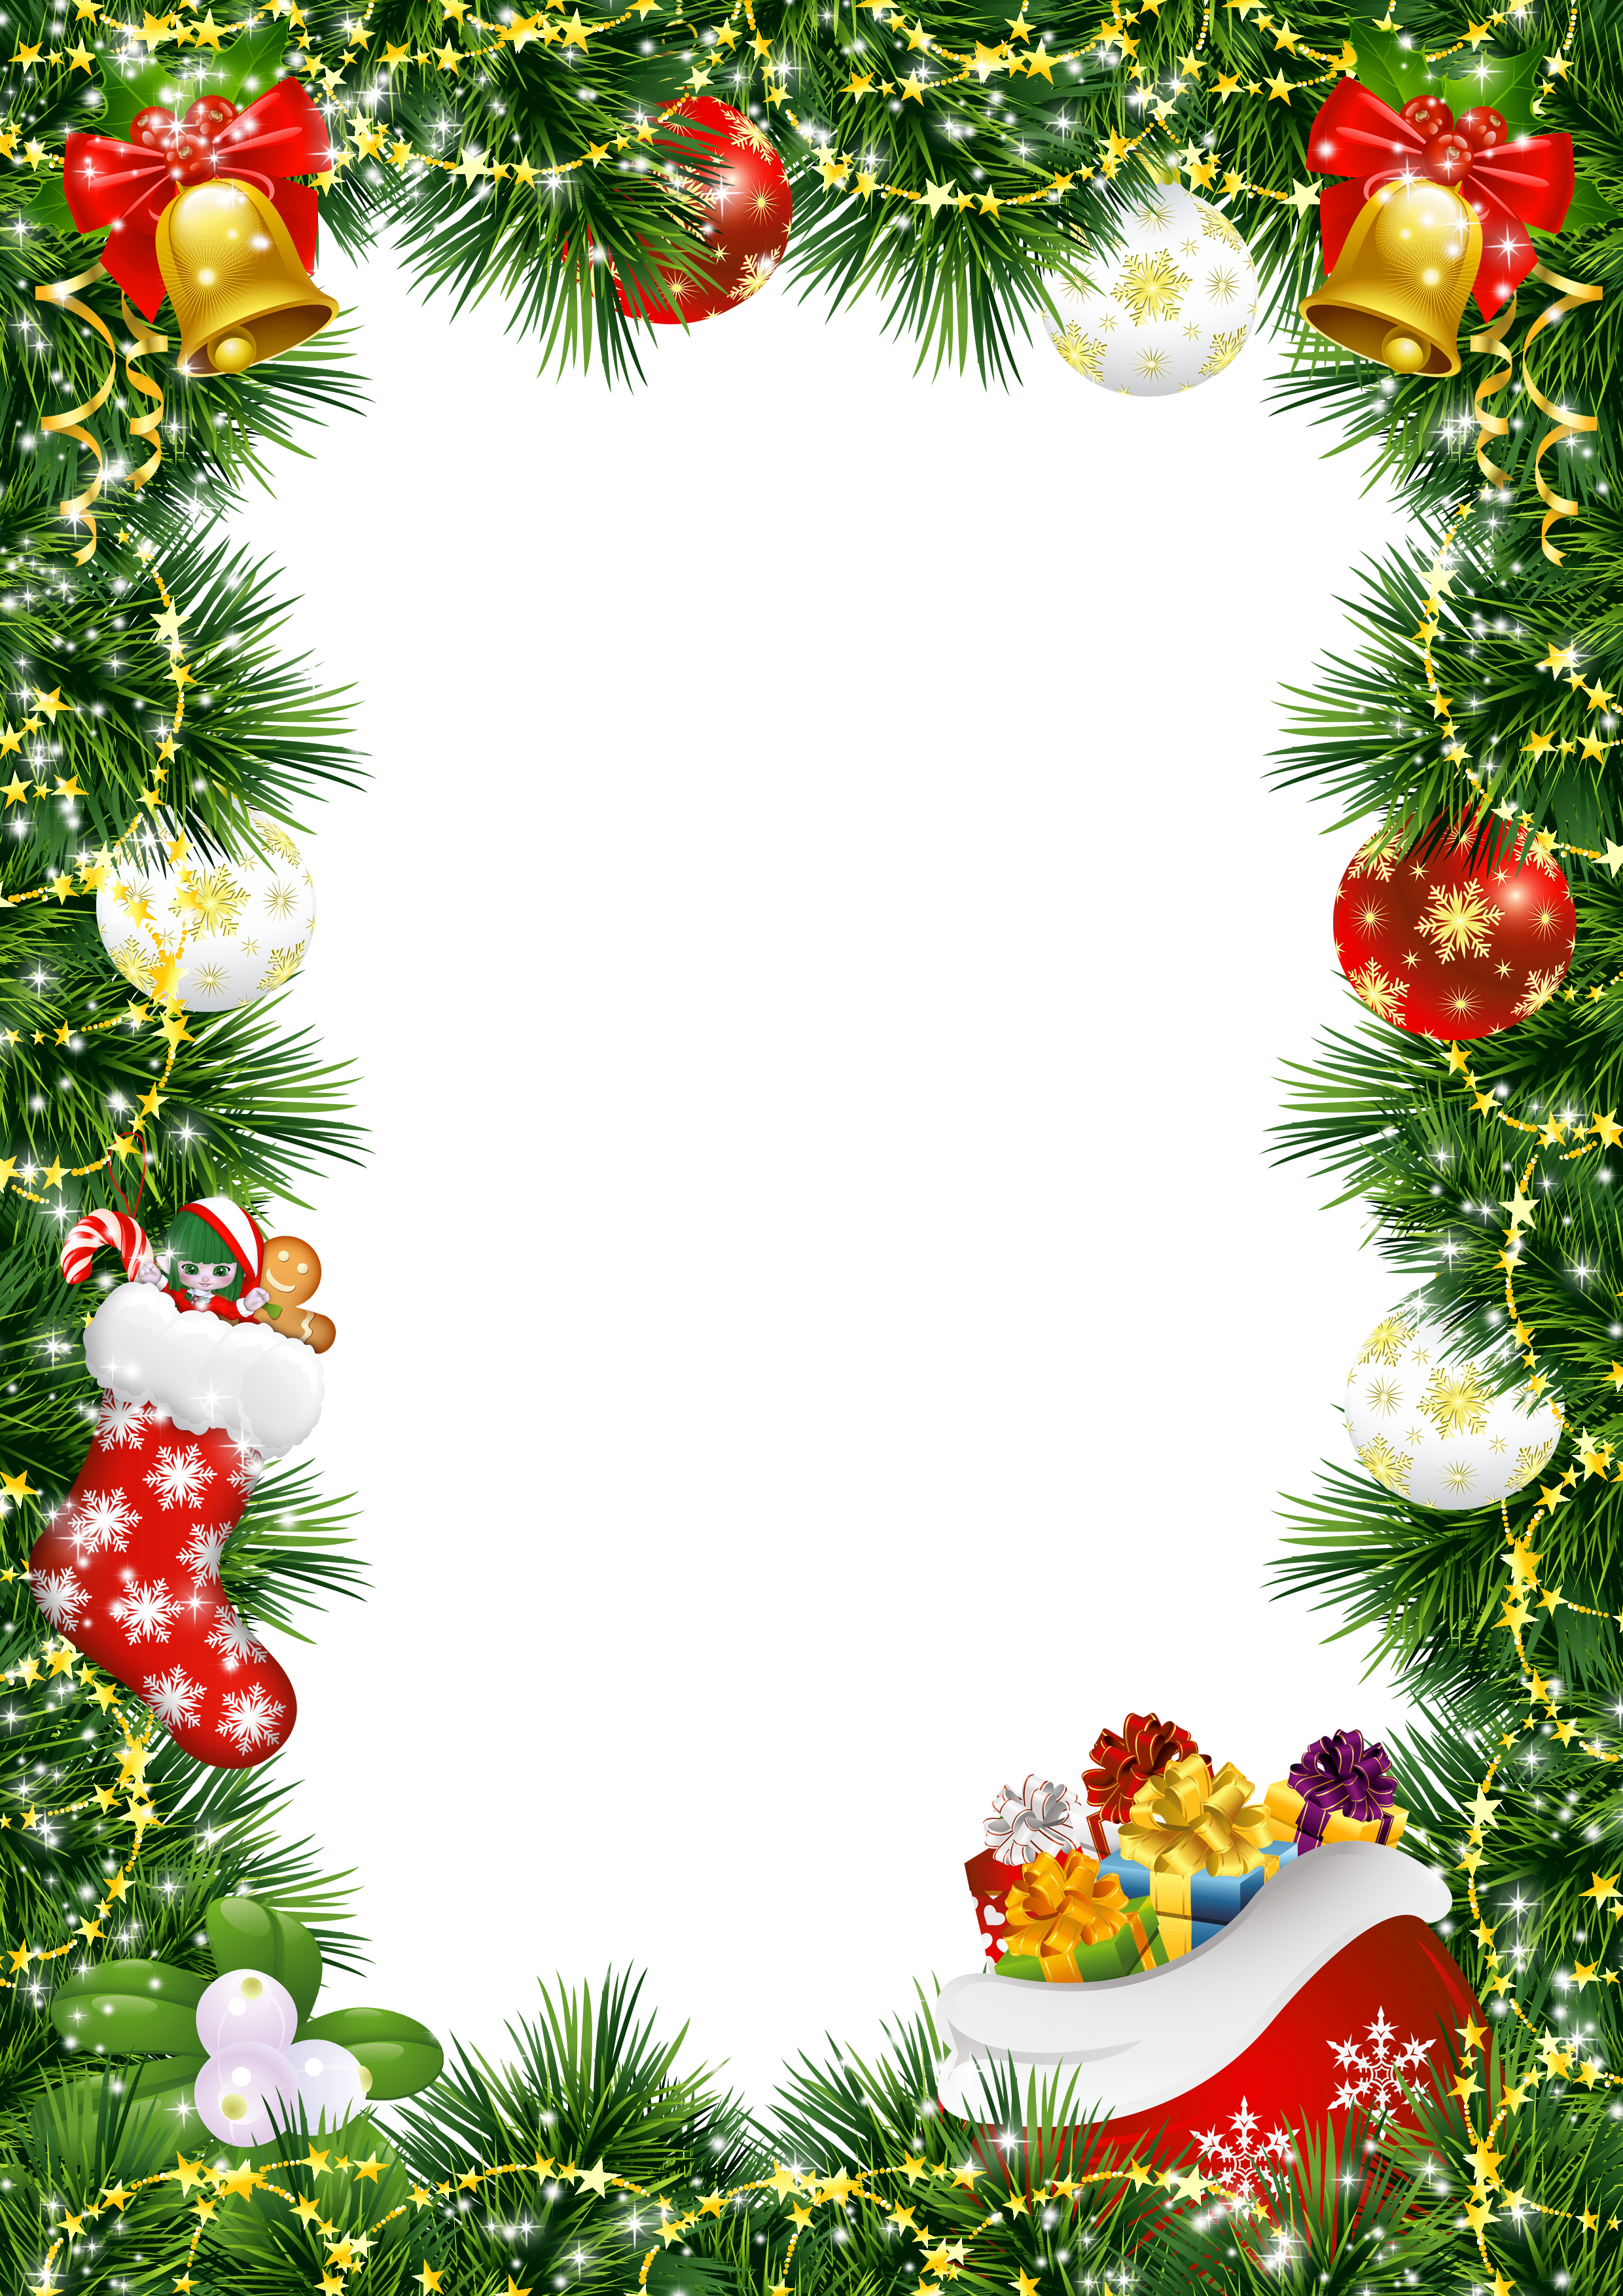 Clipart Noel Christmas Pictures Christmas Border Christmas Frames Christmas Gift Tags